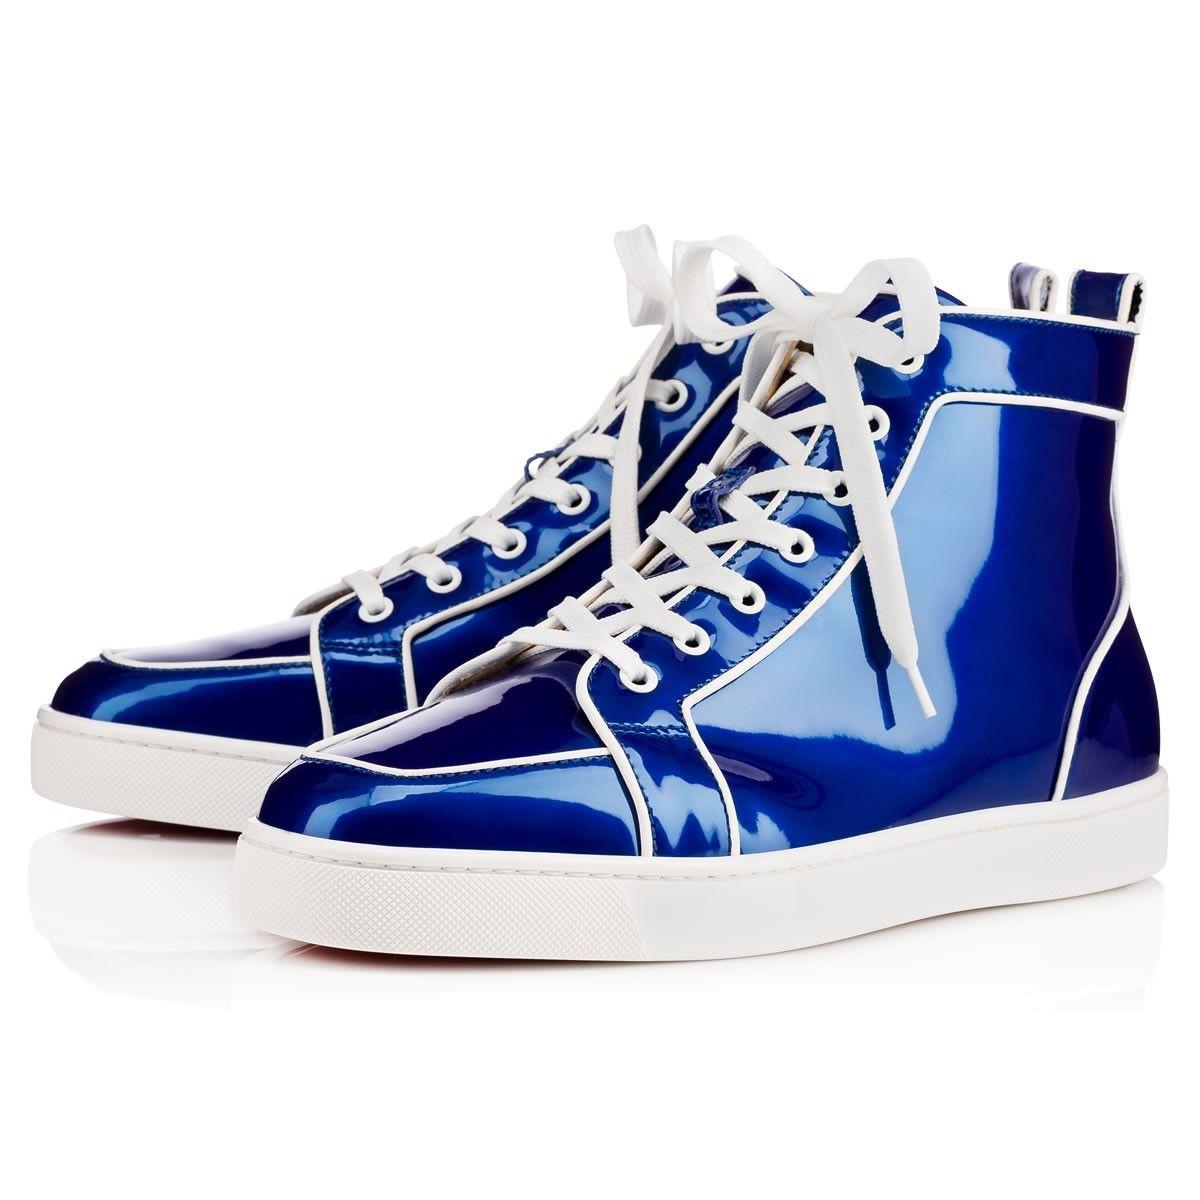 baef013b0000 CHRISTIAN LOUBOUTIN Rantus Orlato Men S Flat Blue Latte Glossy Patent - Men  Shoes - Christian Louboutin.  christianlouboutin  shoes